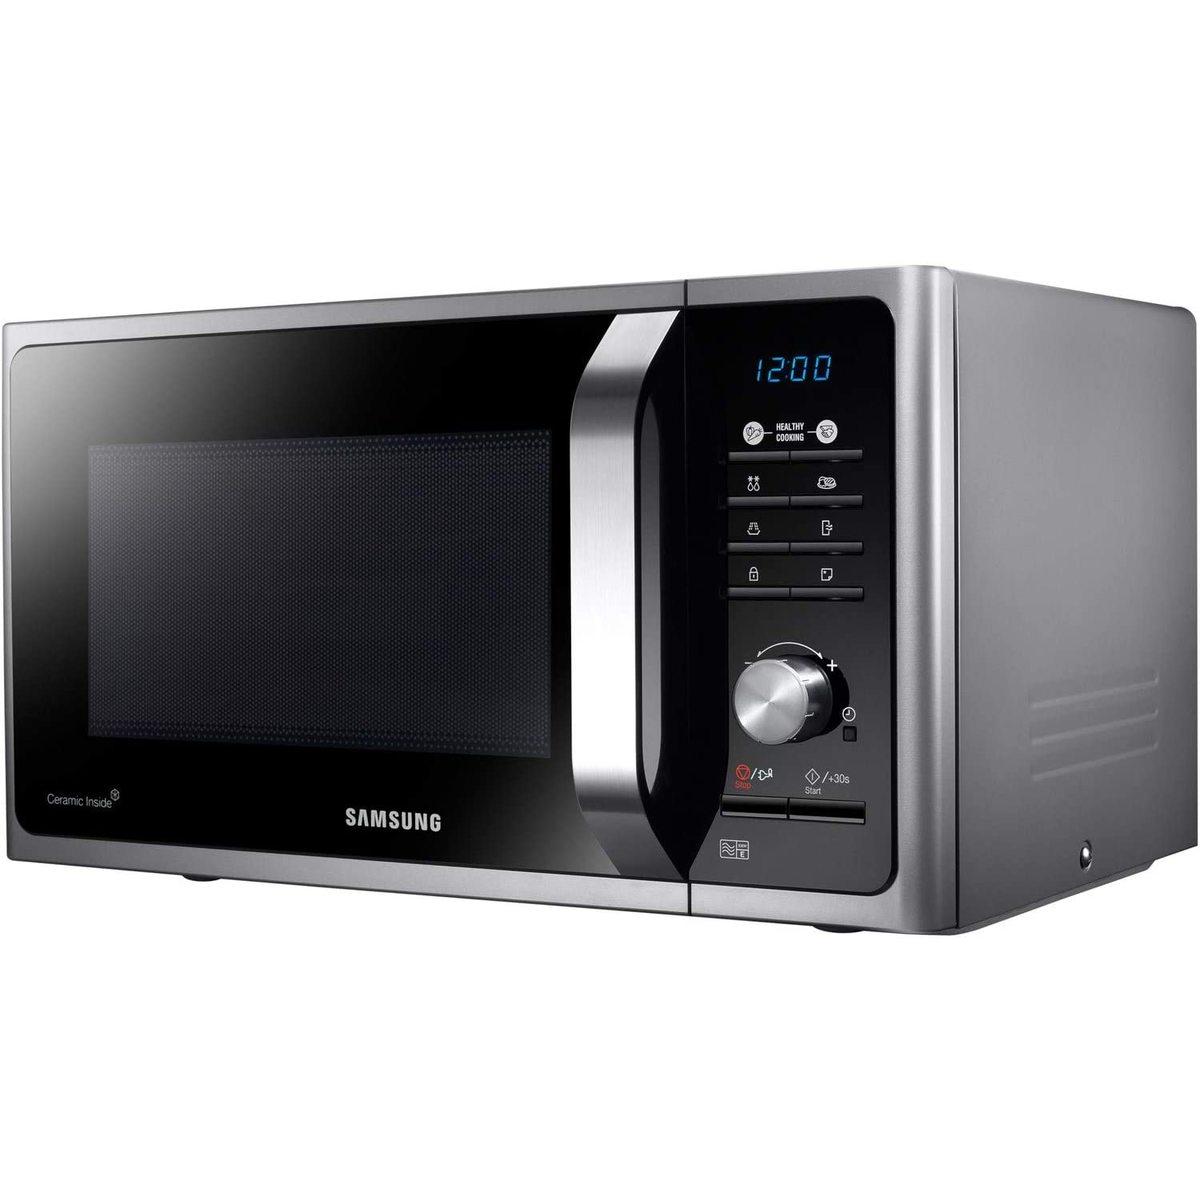 Samsung MS23F301TAS 23L 800W Solo Microwave Oven